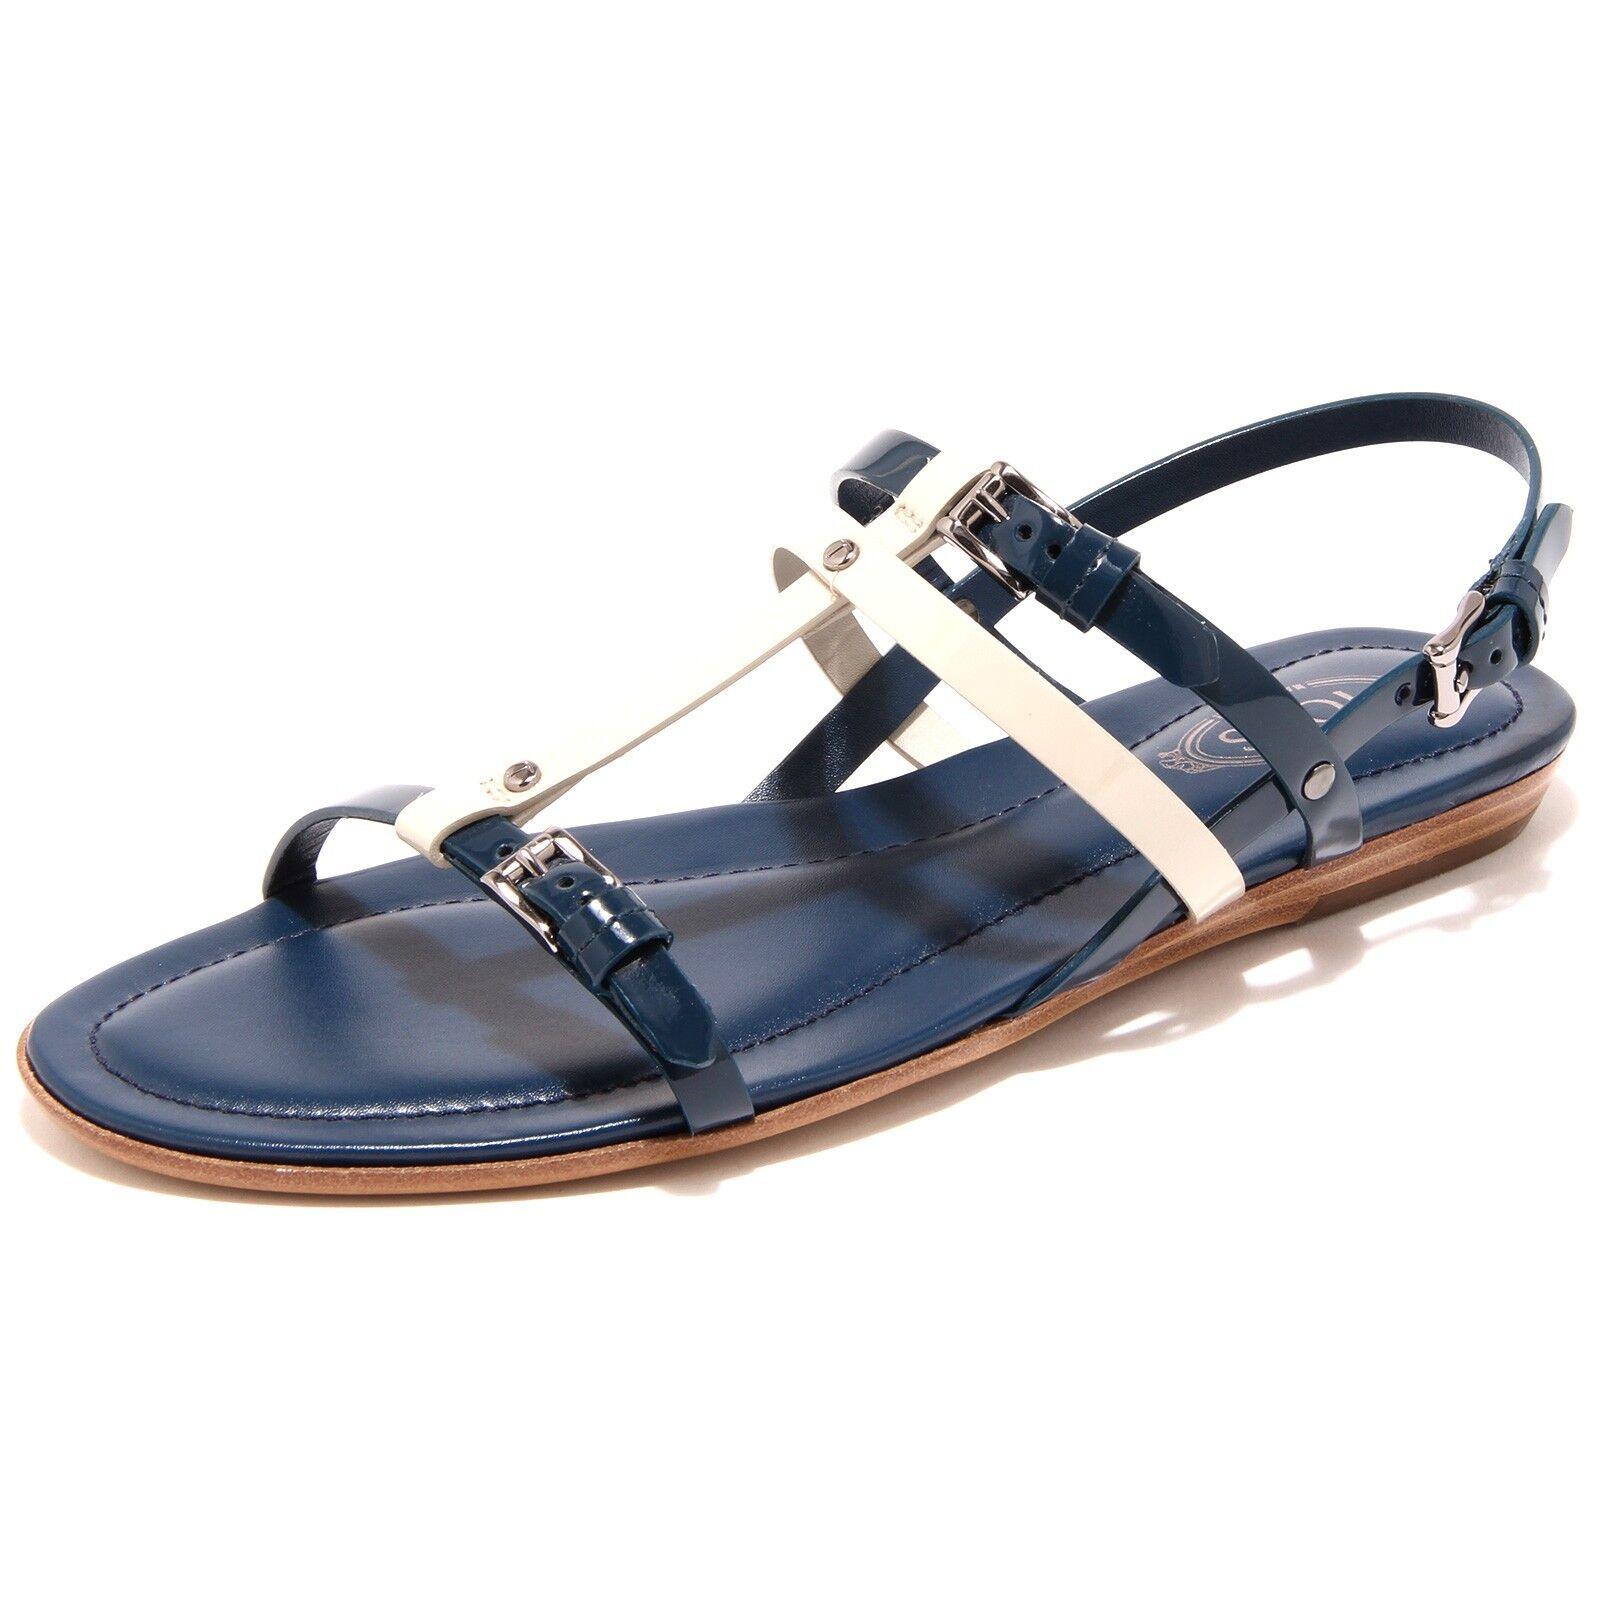 54230 sandalo TOD'S  FIBBIETTE blu  scarpa donna shoes women